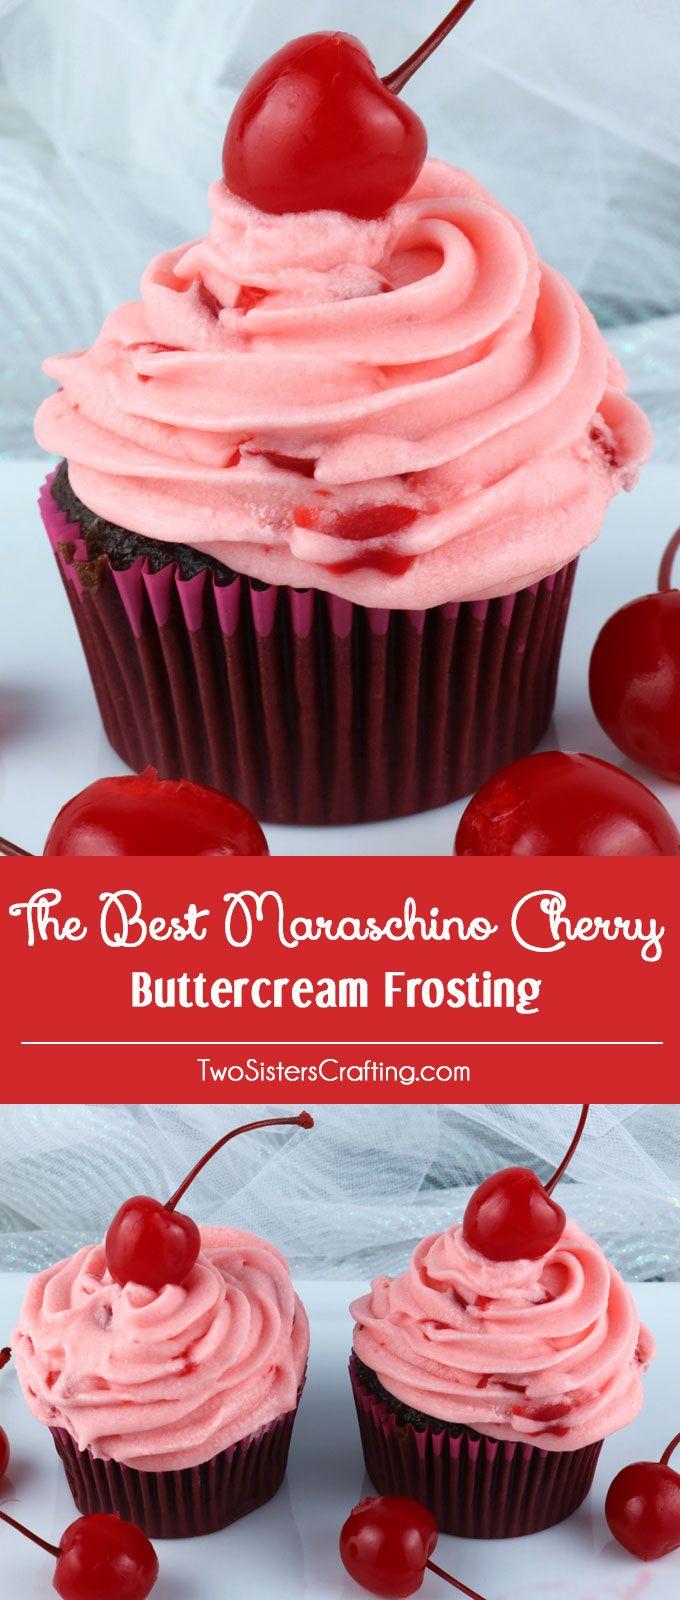 The Best Maraschino Cherry Buttercream Frosting #cupcakefrostingtips